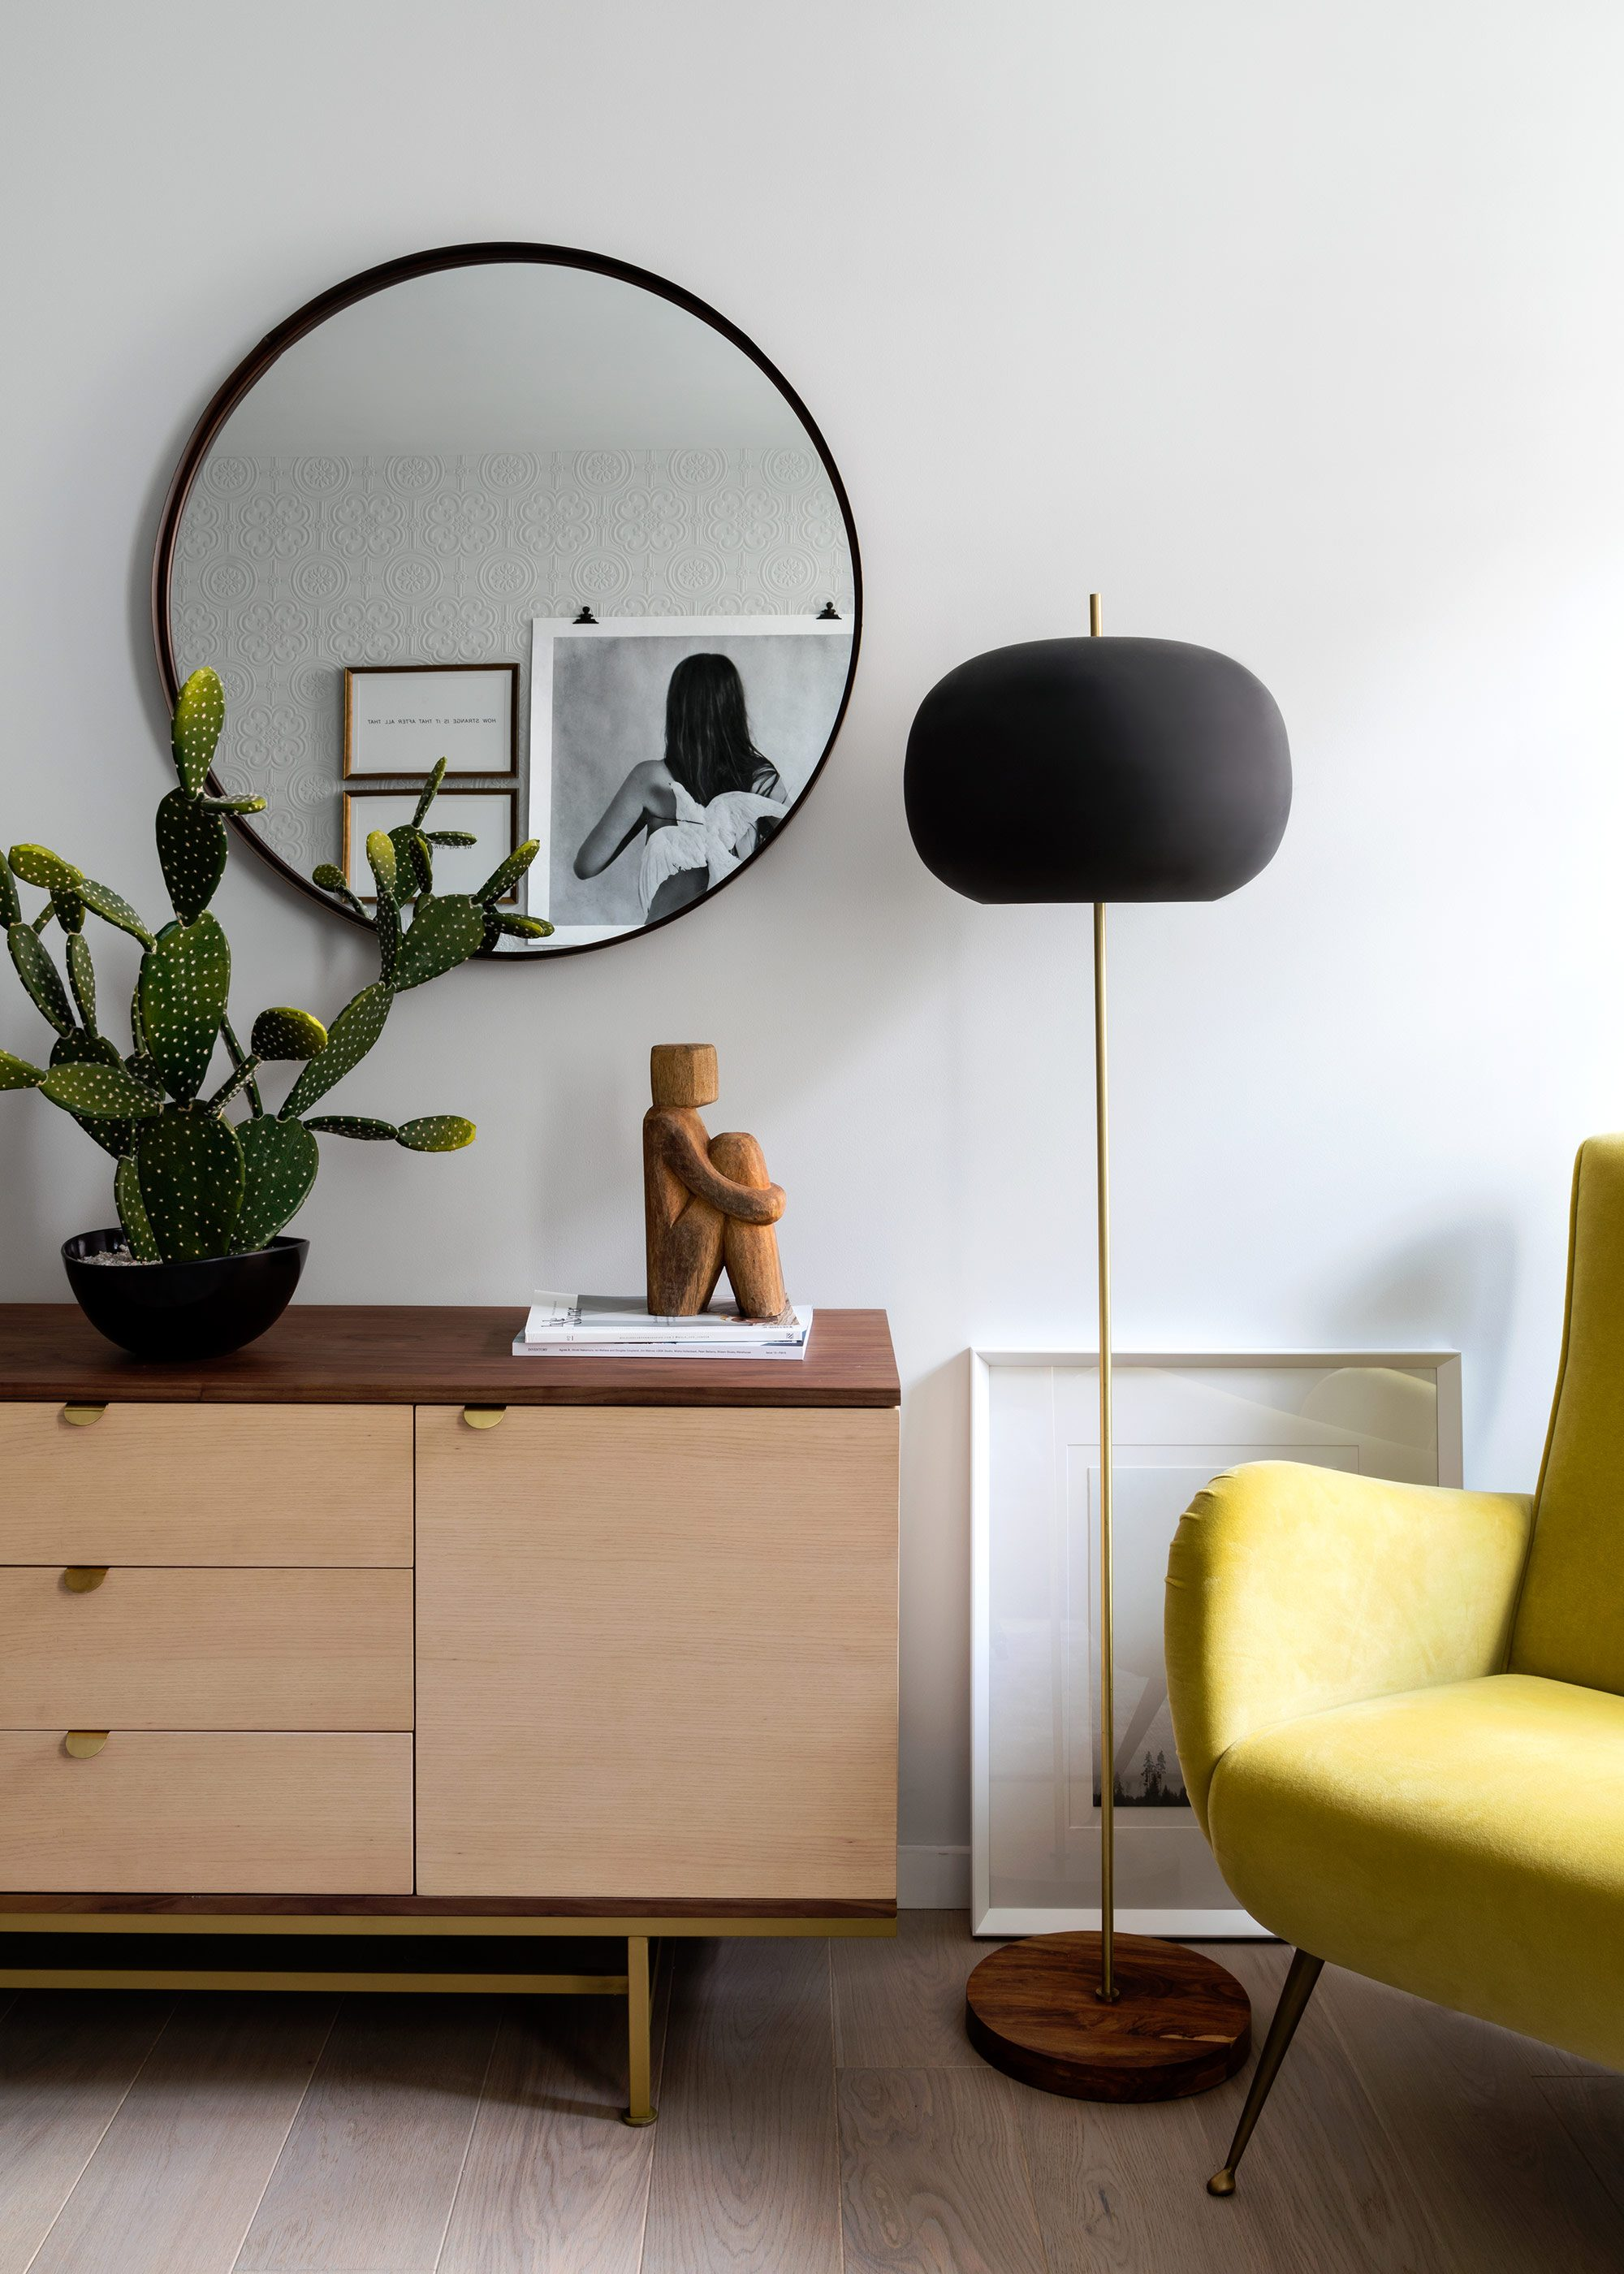 Honky Interior Design London Apartment SE1 1b Living Room